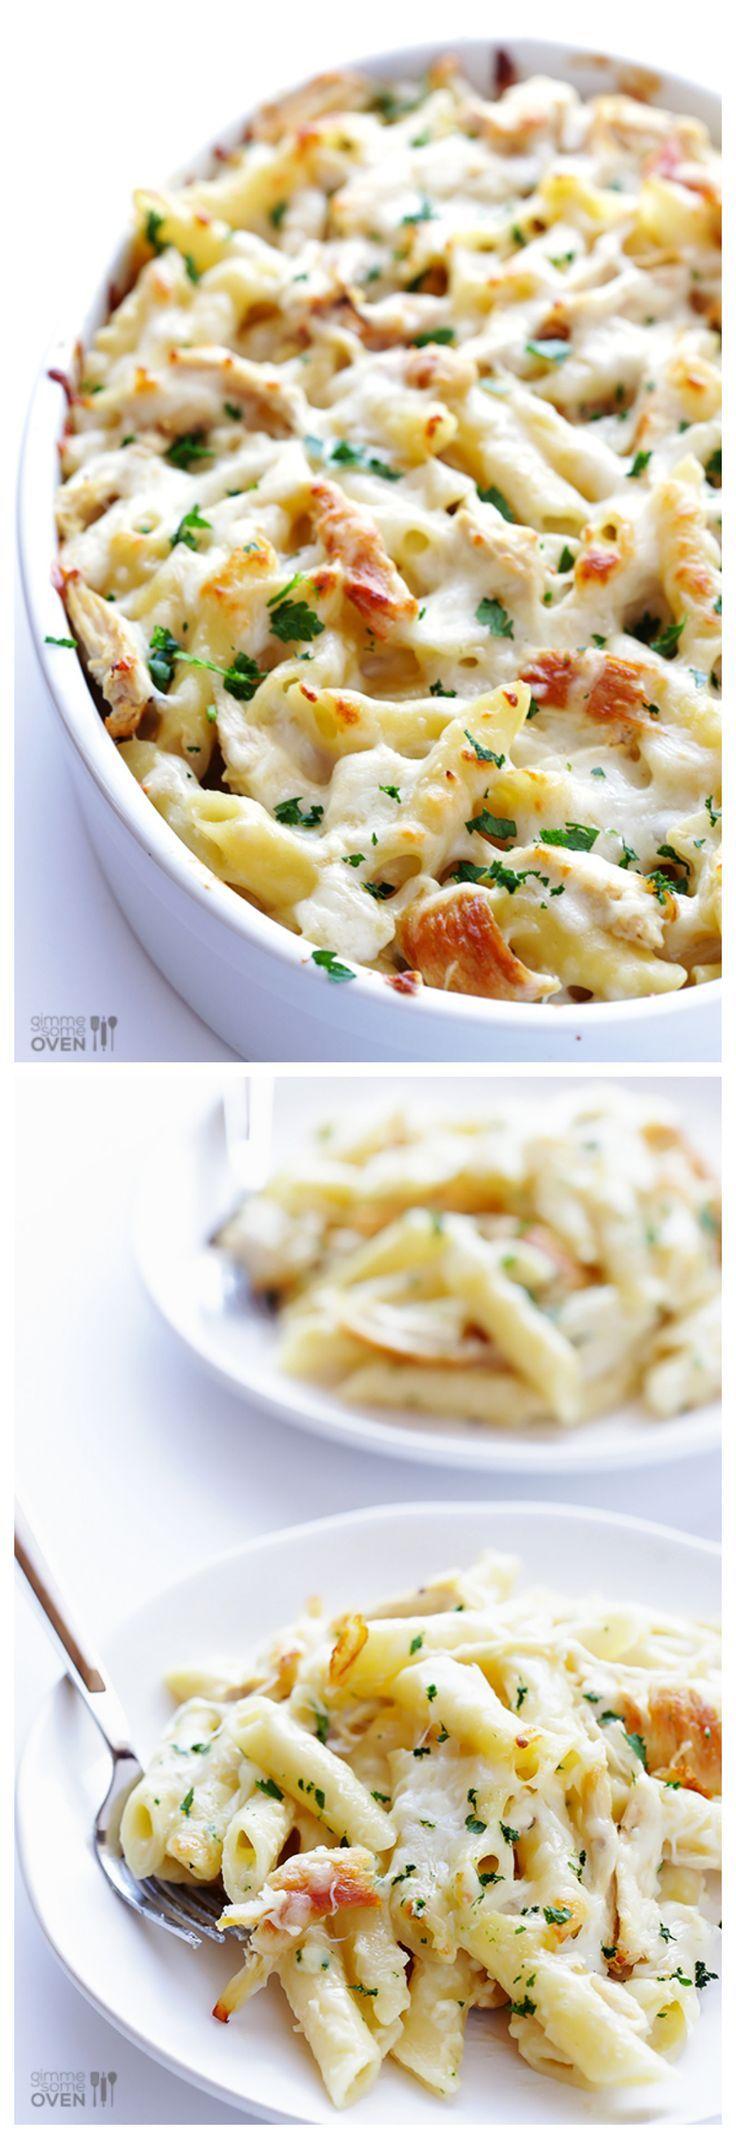 Creamy + declicious chicken alfredo baked ziti | gimmesomeoven.com #OnePotPasta: